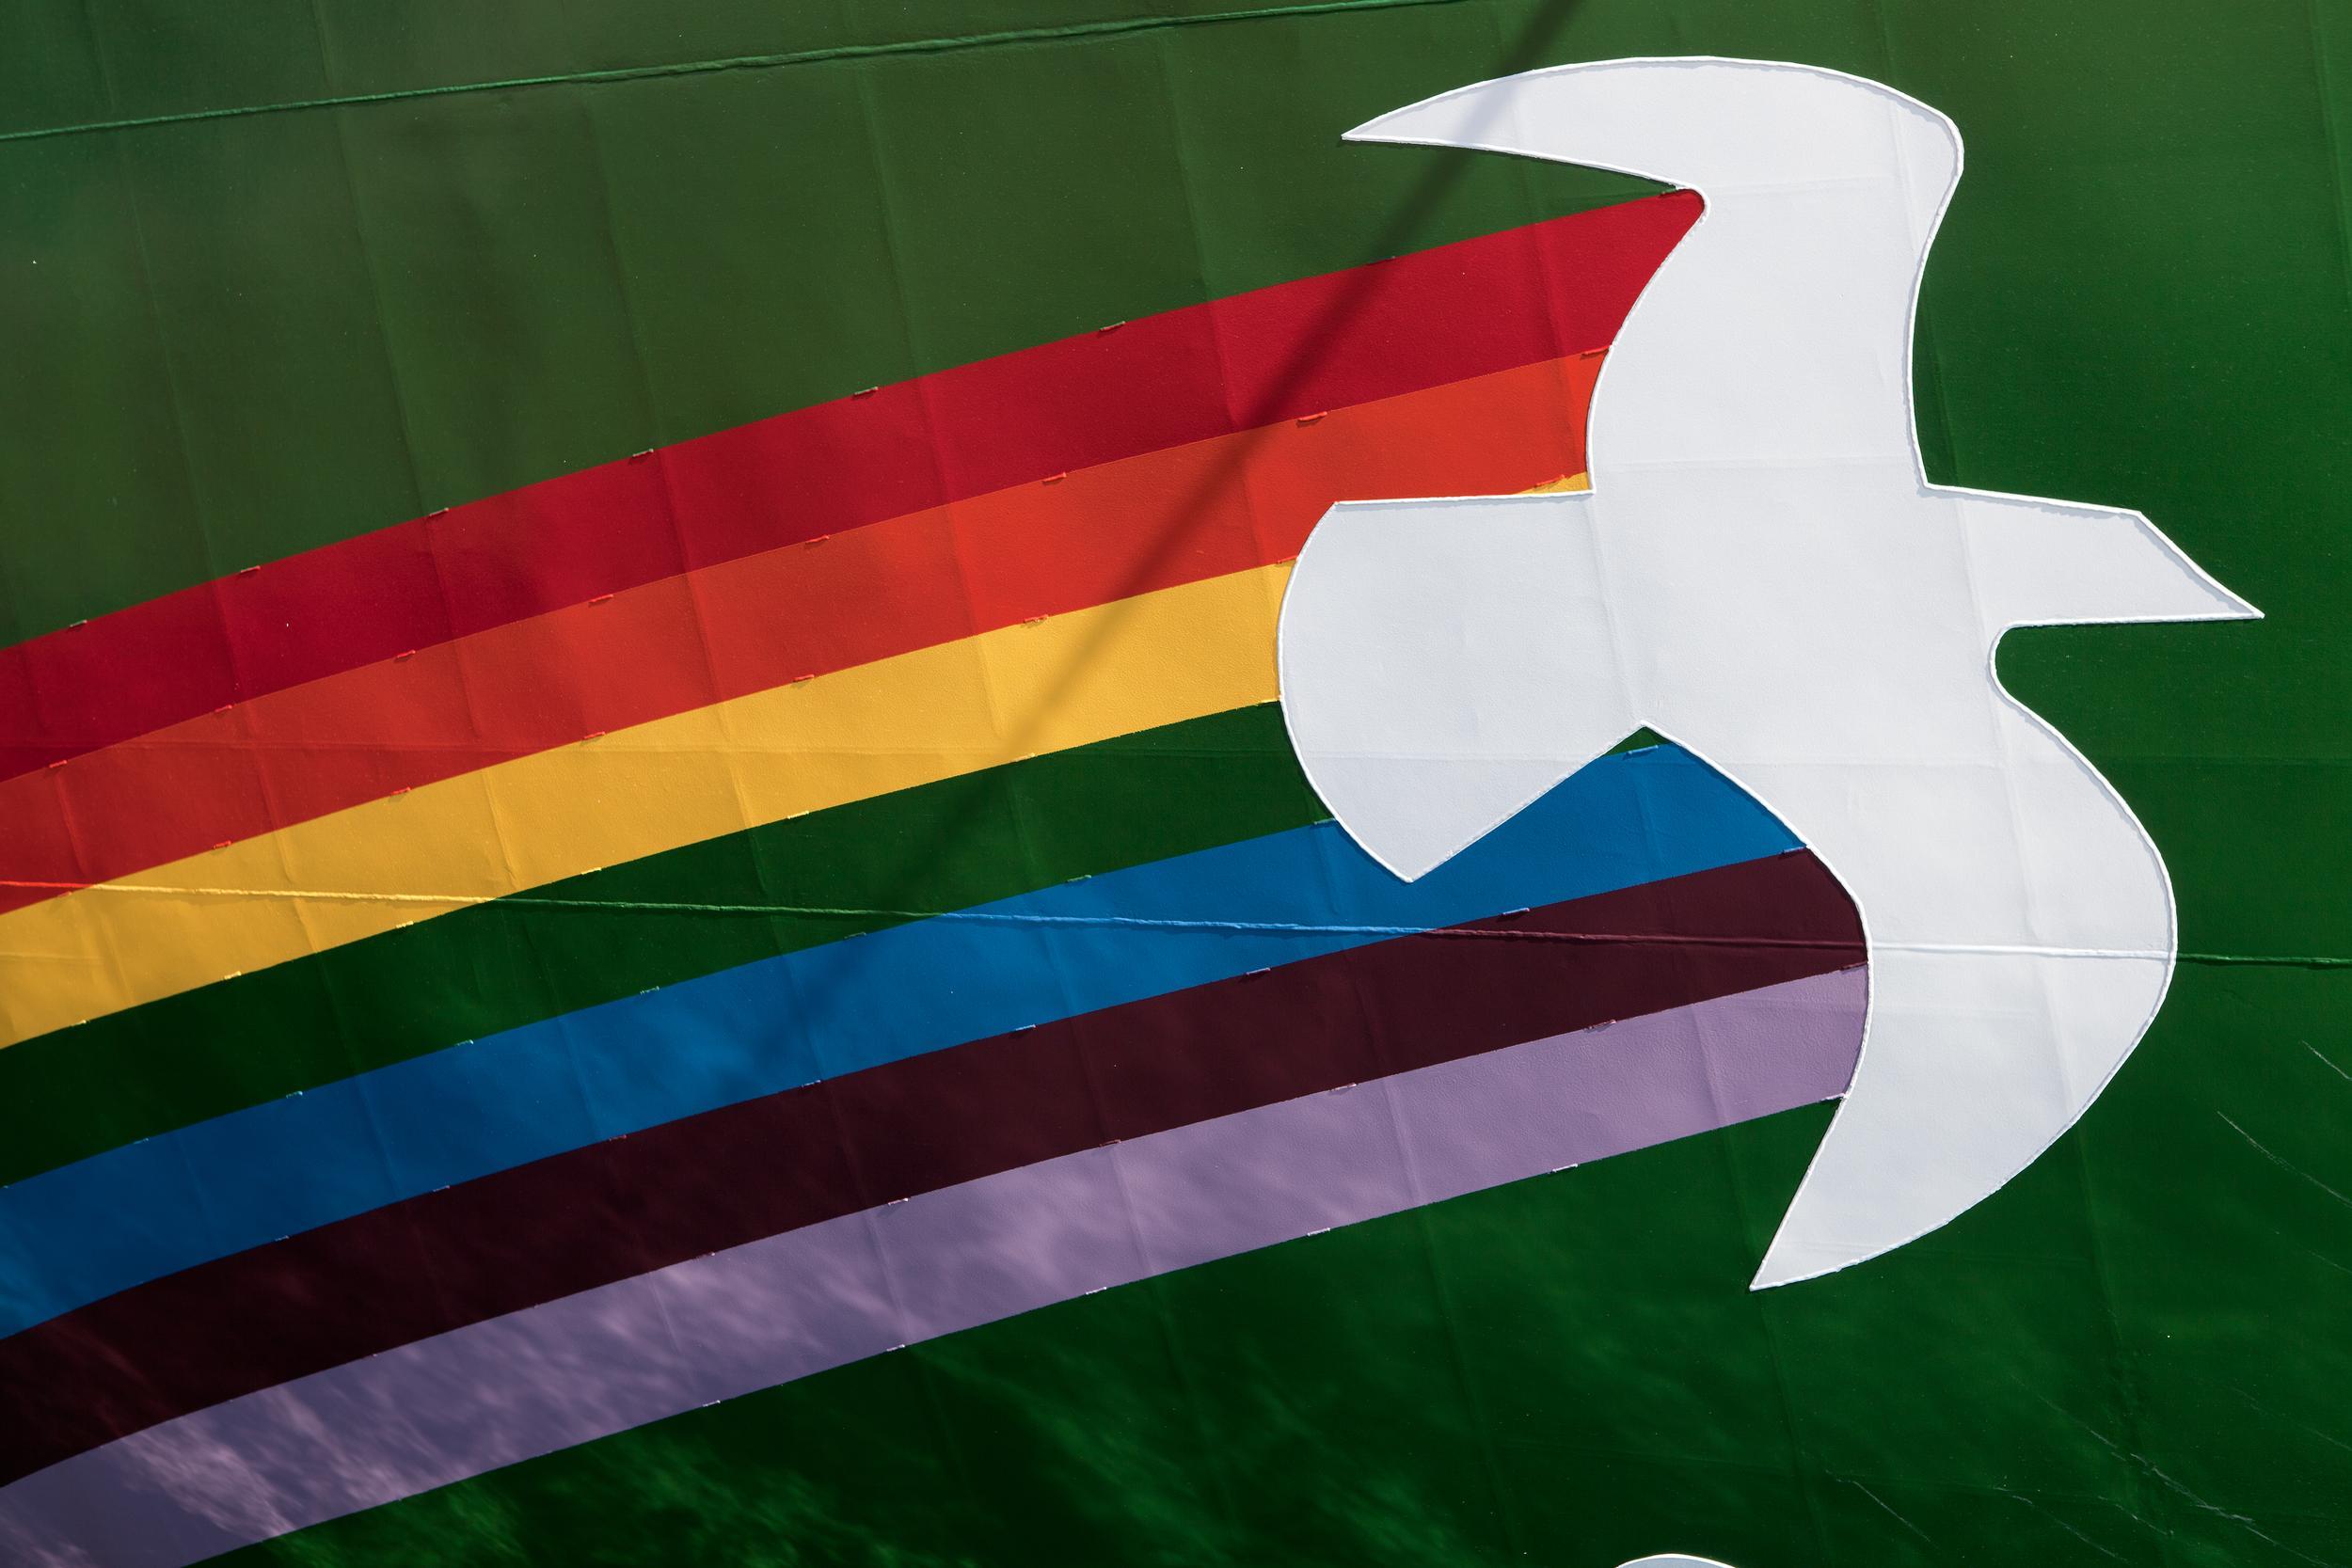 illustration of peace dove on a rainbow